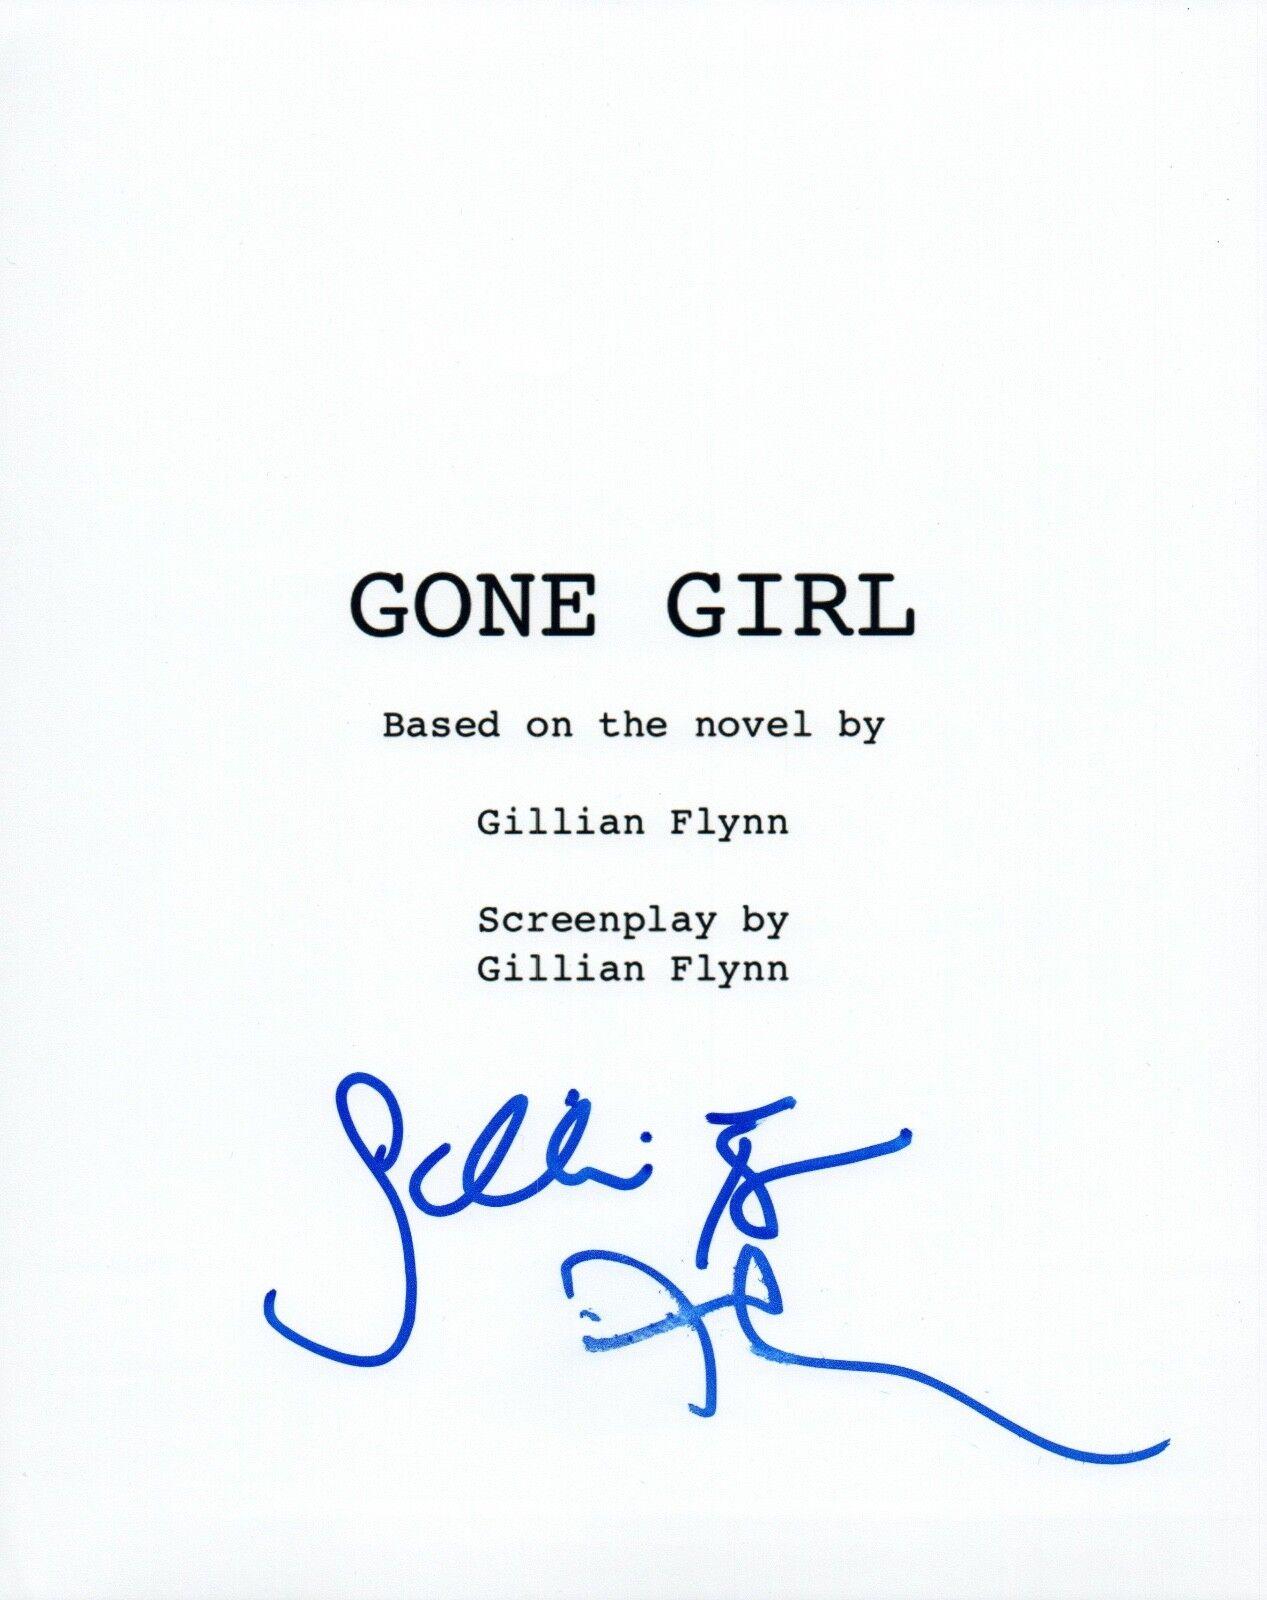 David fincher & gillian flynn signed autographed gone girl movie script coa vd